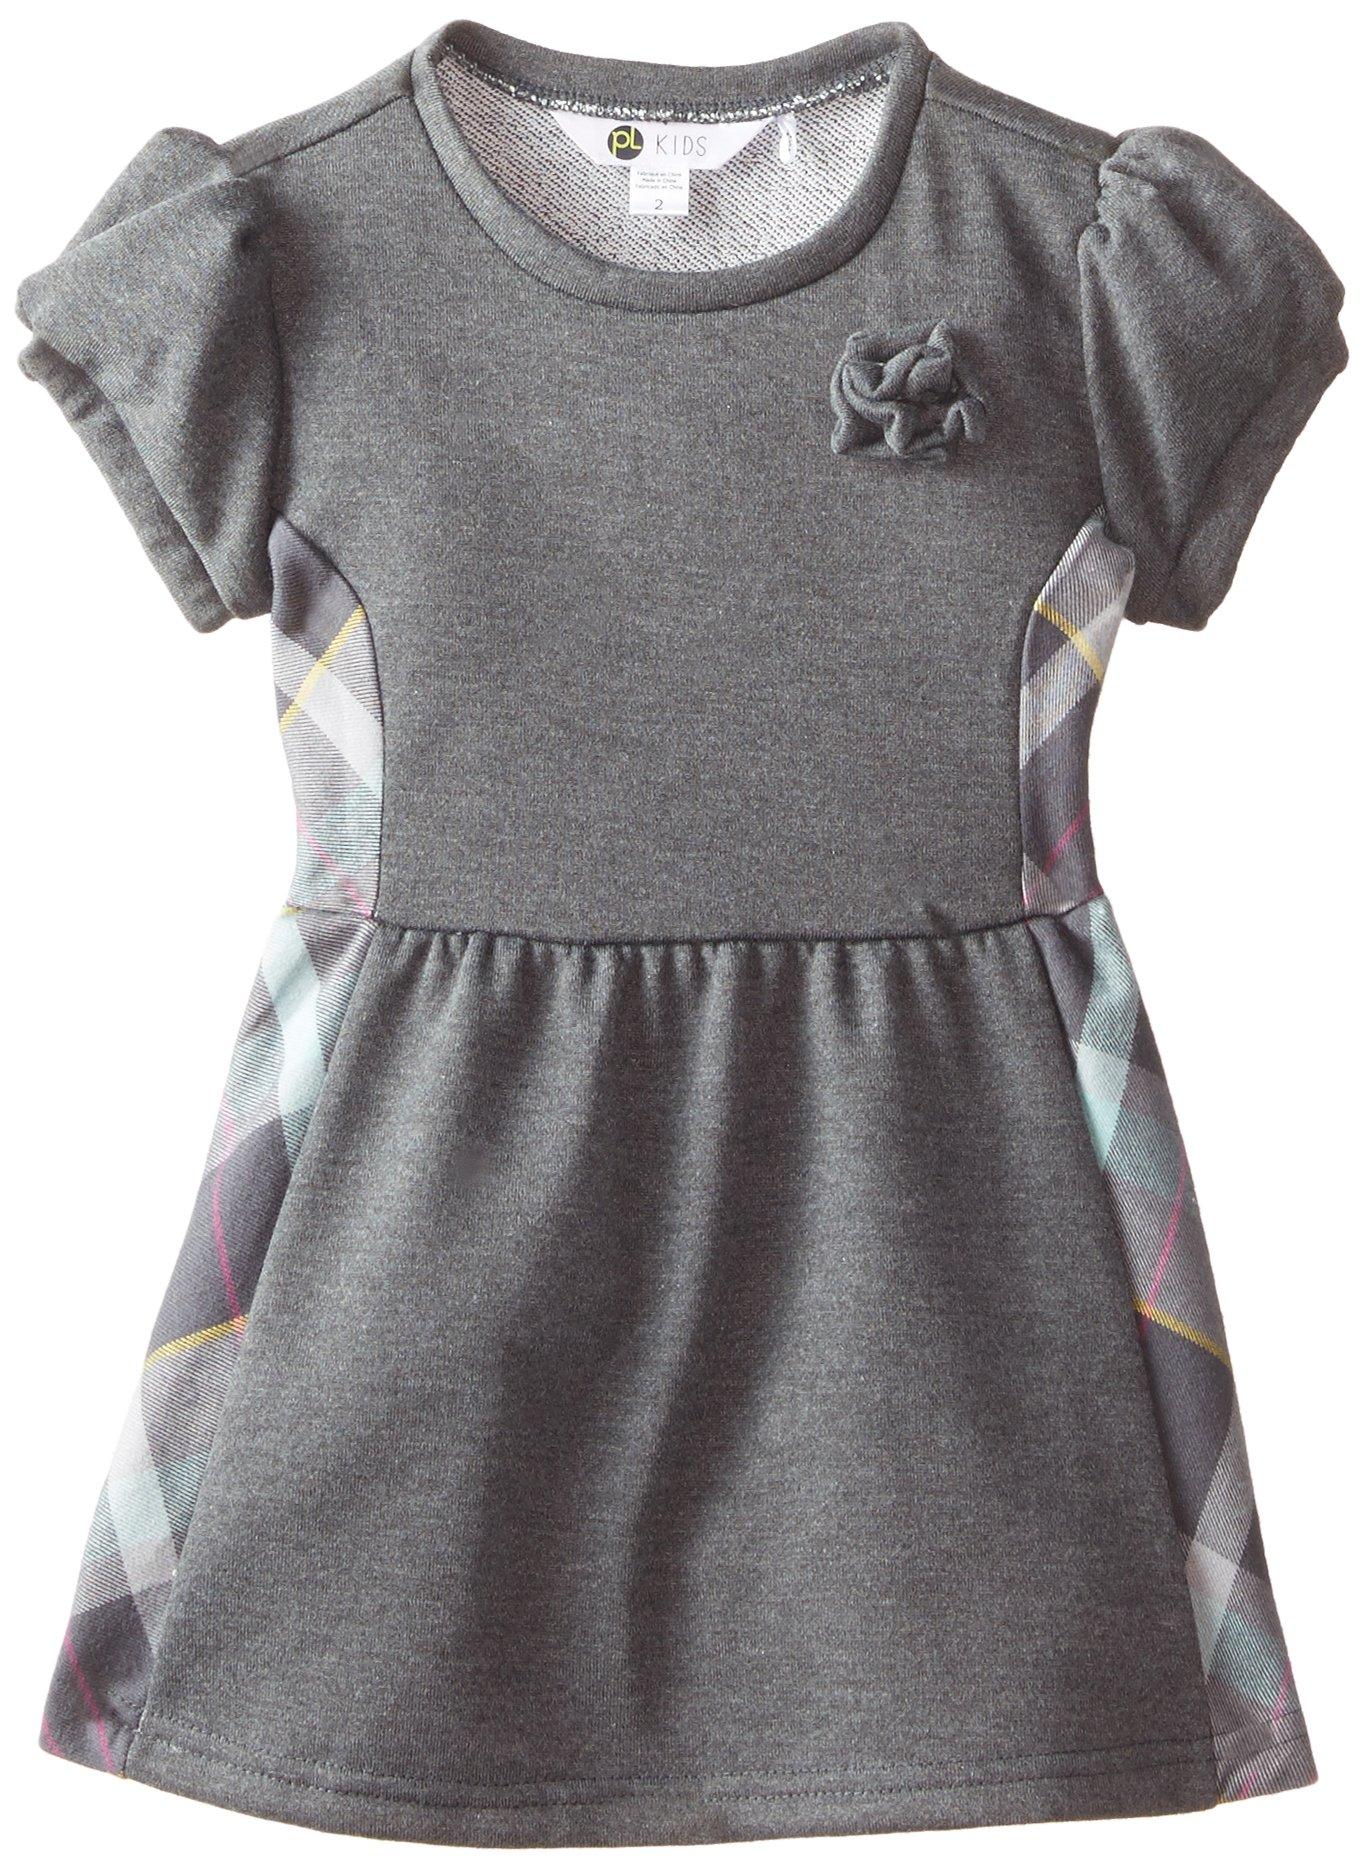 Petit Lem Little Girls' Cocooning Dress, Grey, 5 by Petit Lem